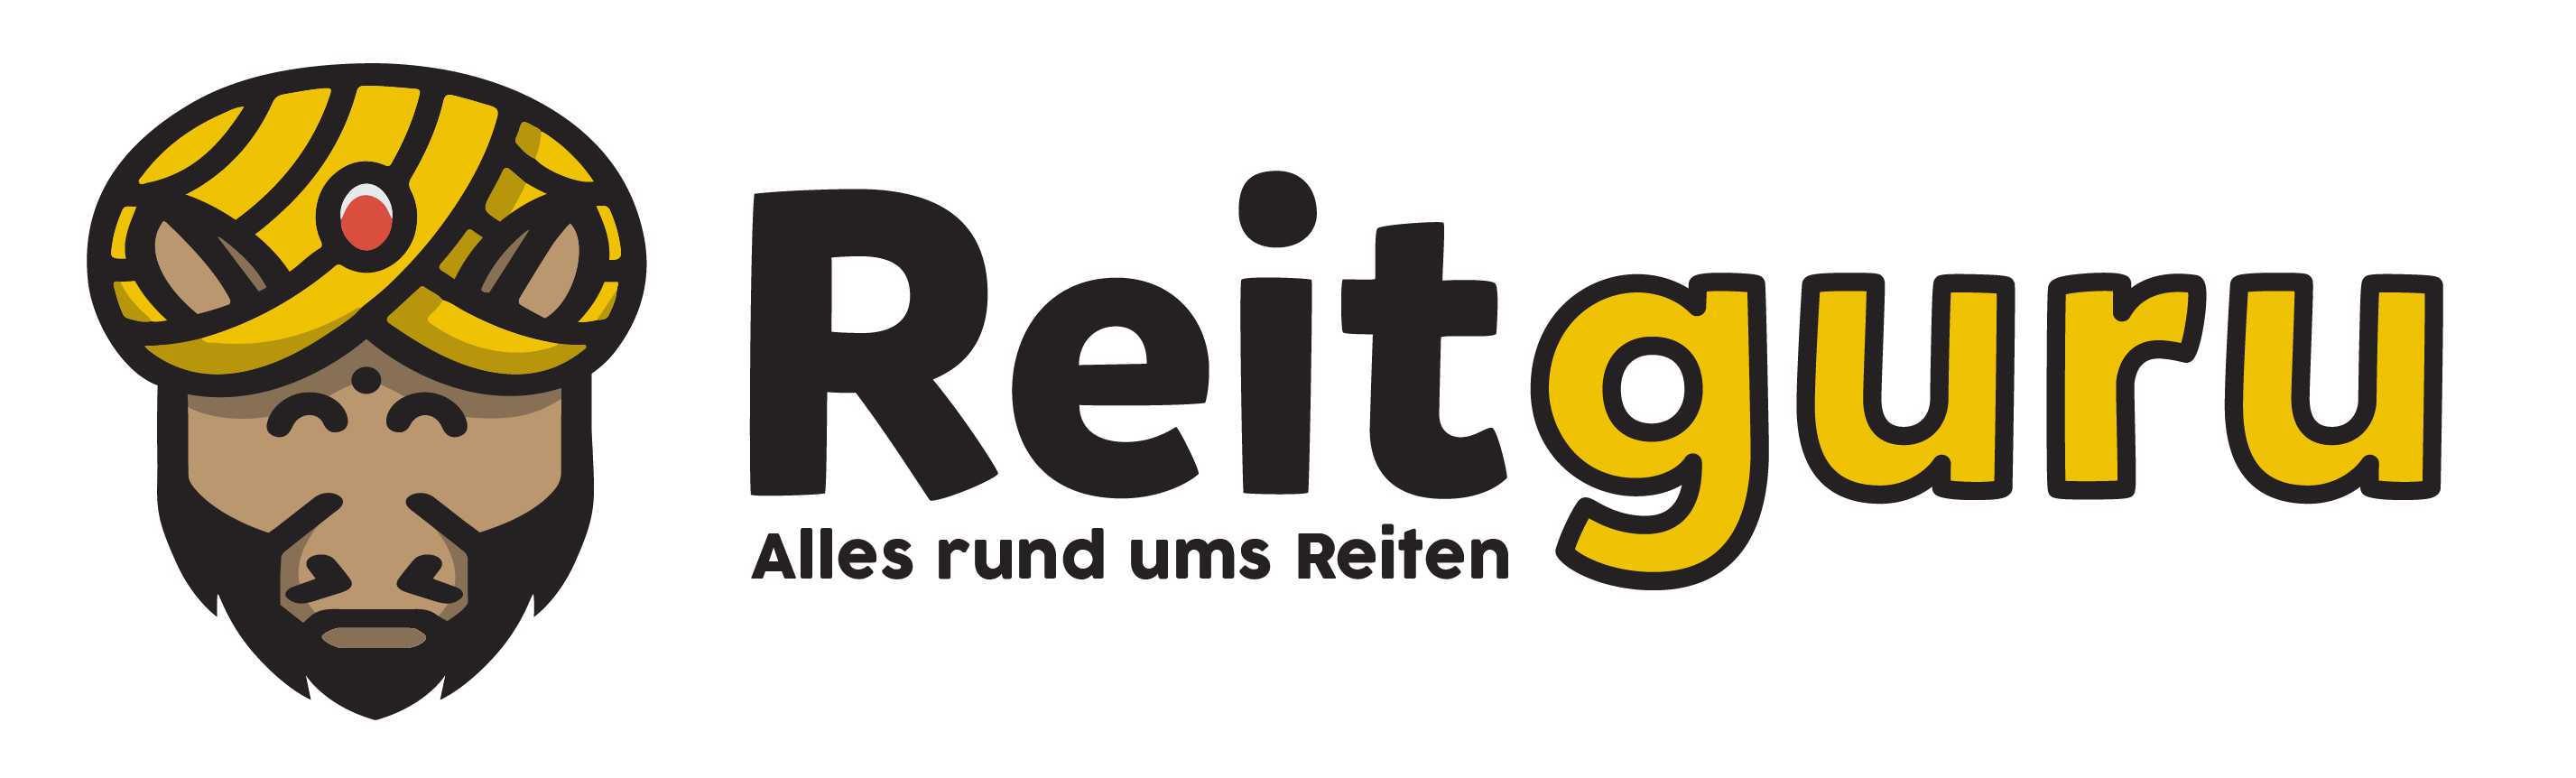 Reitguru.de